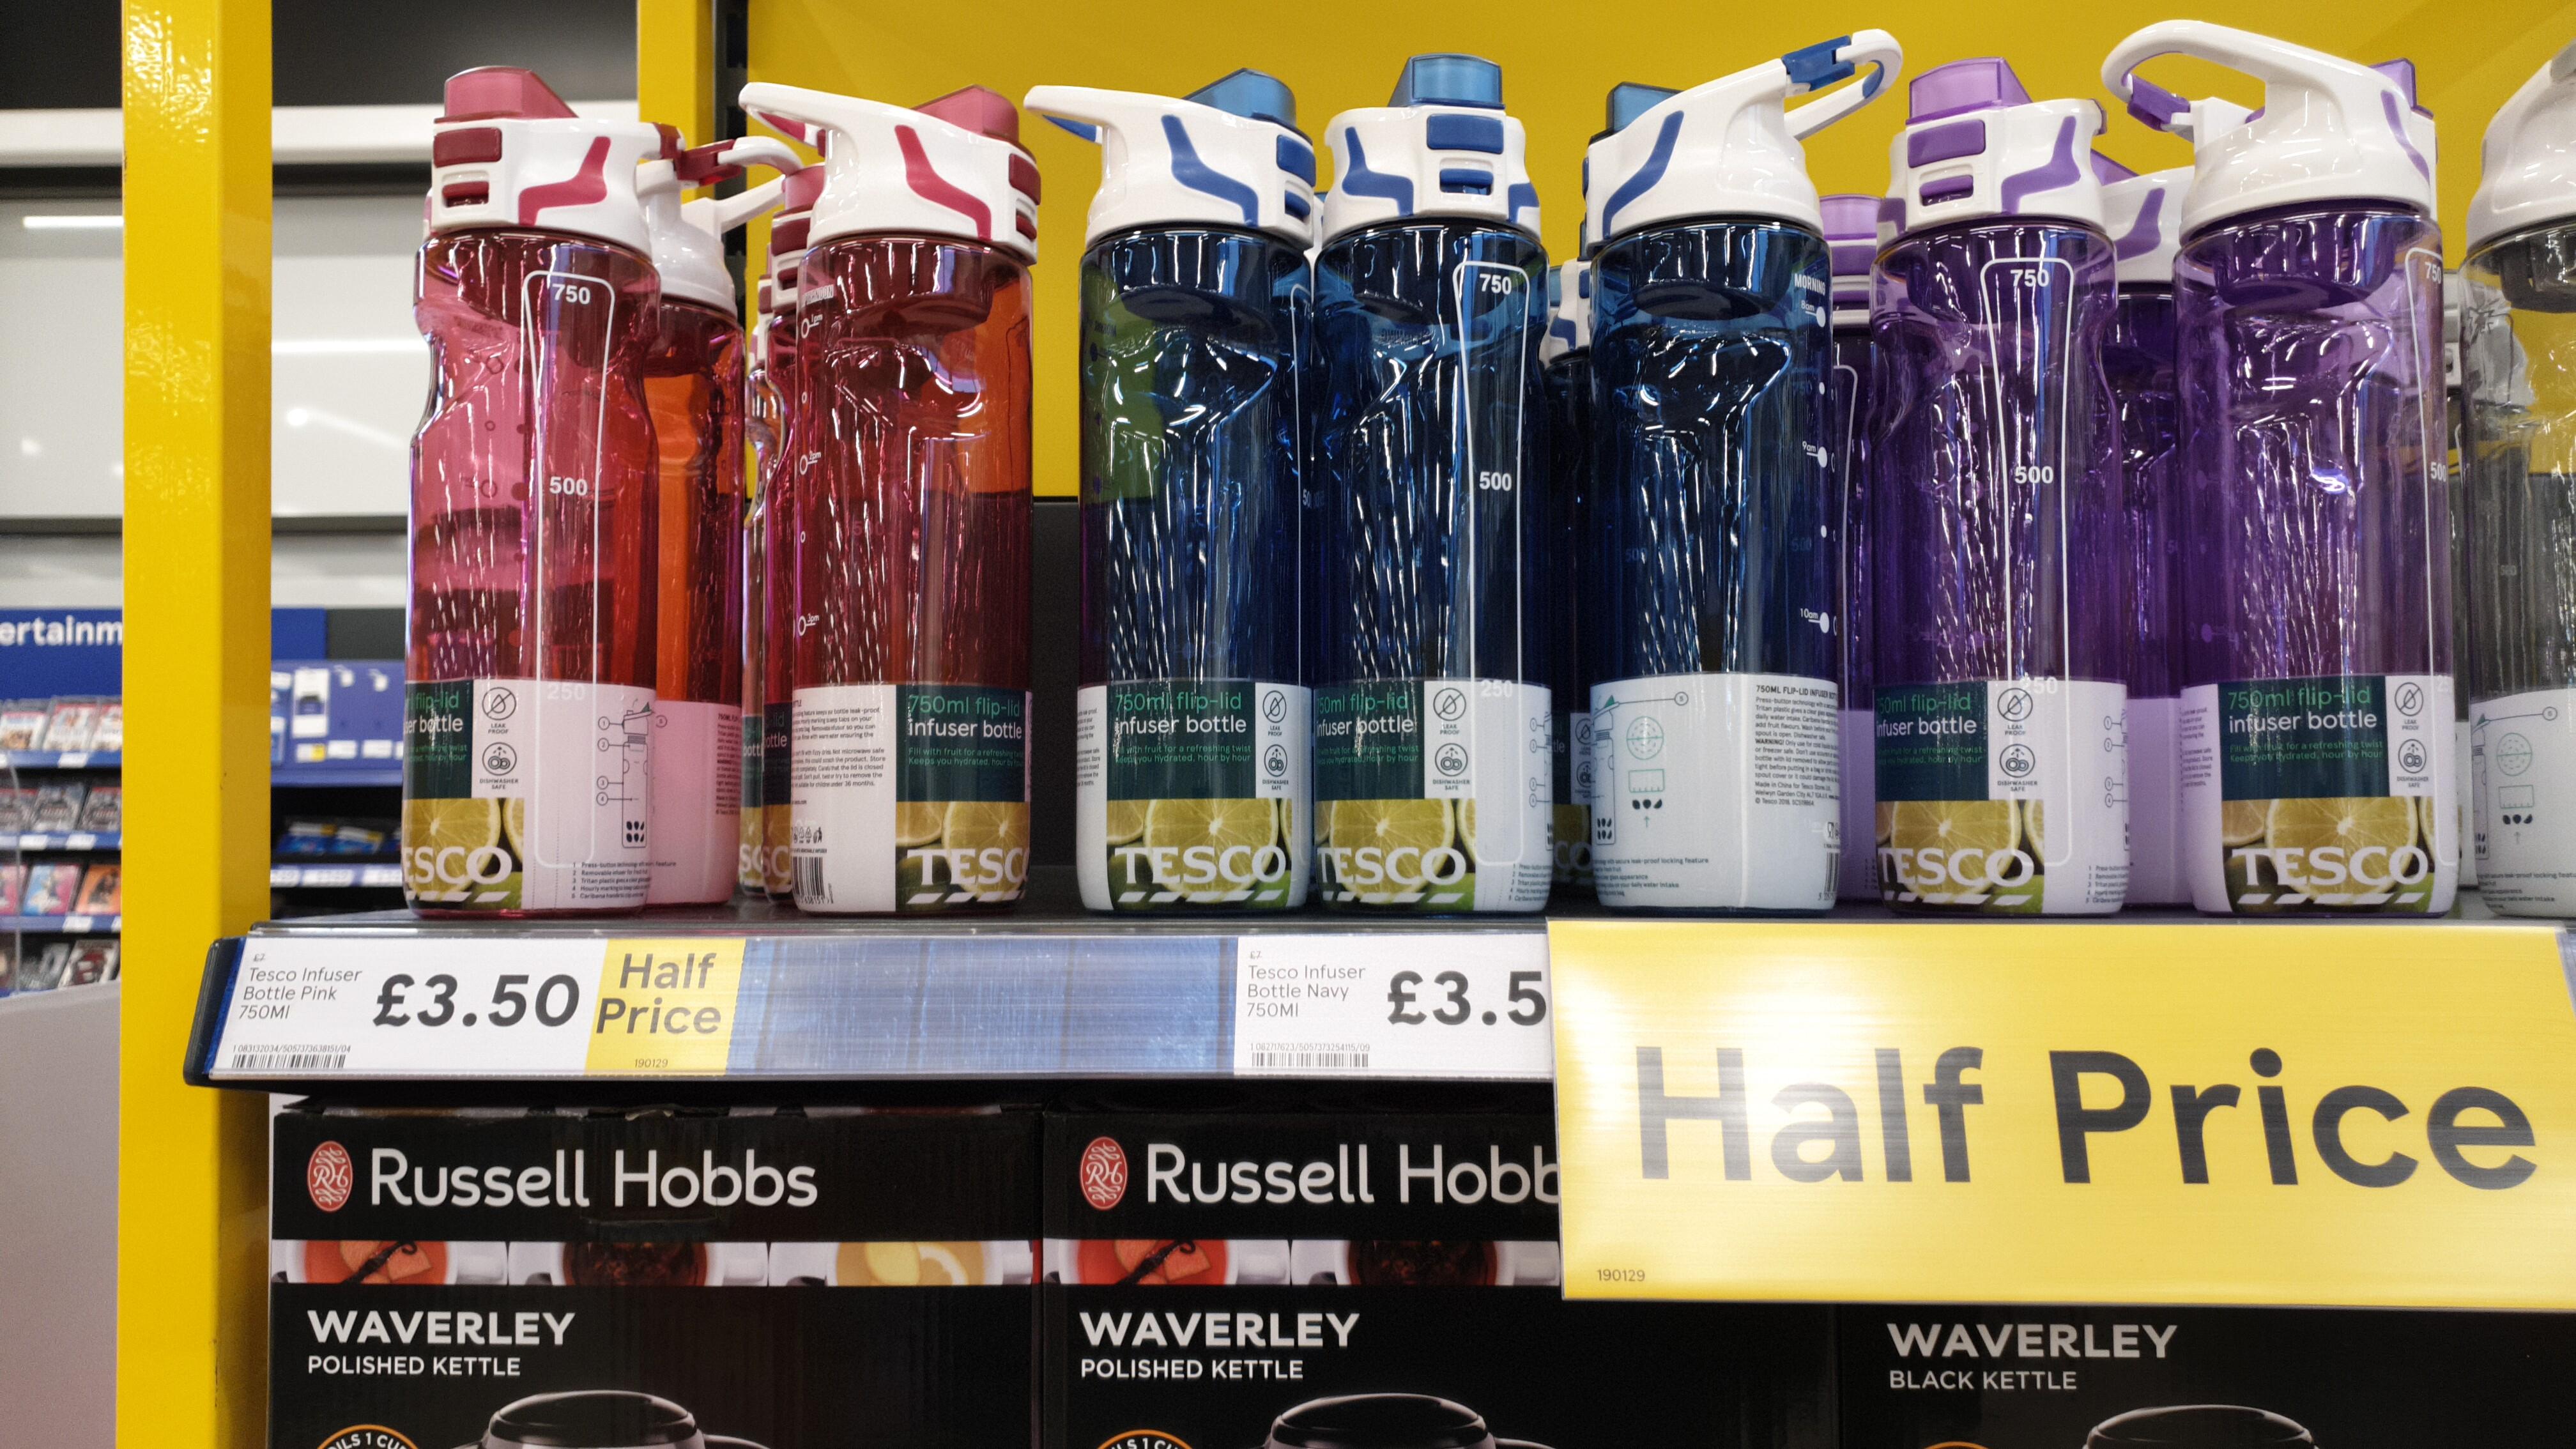 Tesco drink bottle 750ml fliplid with fruit infuser half price £3.50